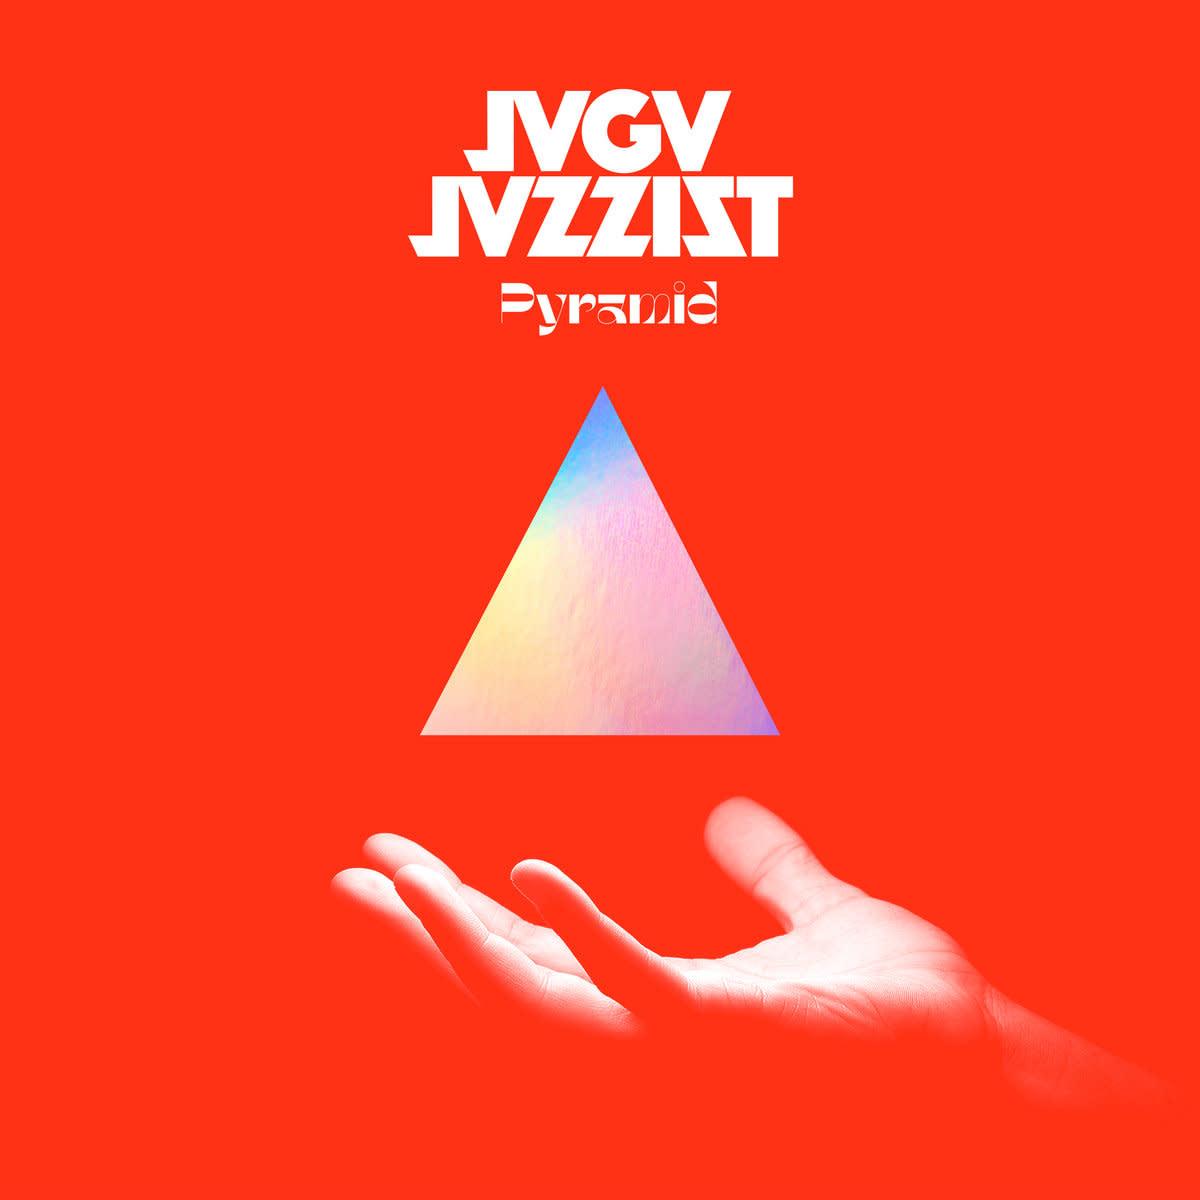 Jaga Jazzist • Pyramid-1